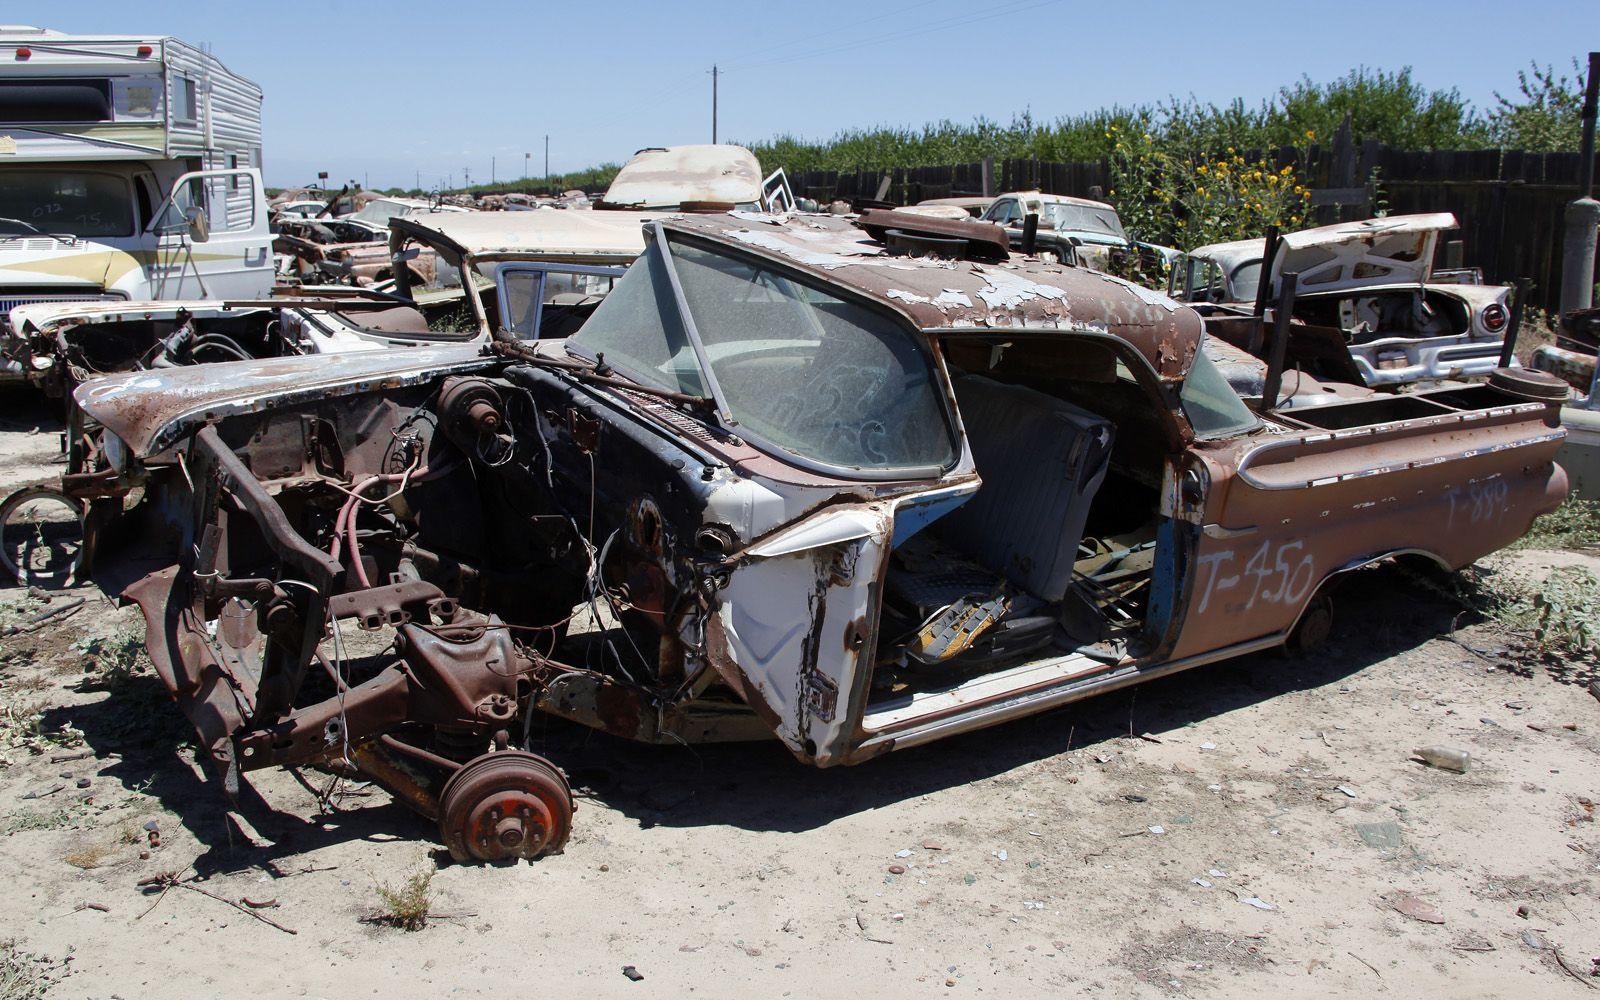 Turners Auto Wrecking >> Junkyard Vintage Cars Turners Auto Wrecking Fresno